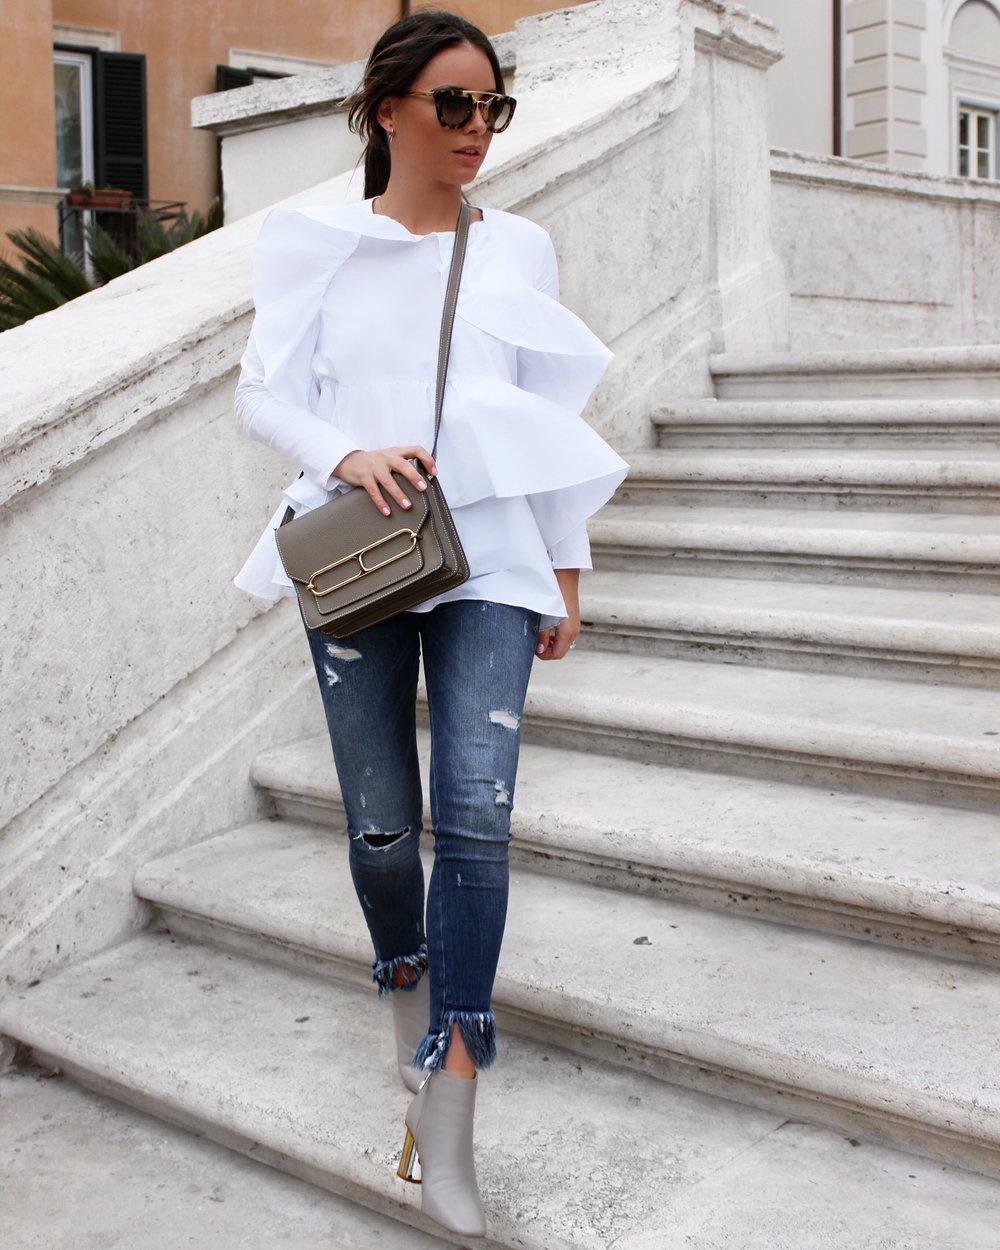 Zara Top here, Zara Jeans here, Zara Boots here, Prada Sunglasses here, Hermes Roulis Bag